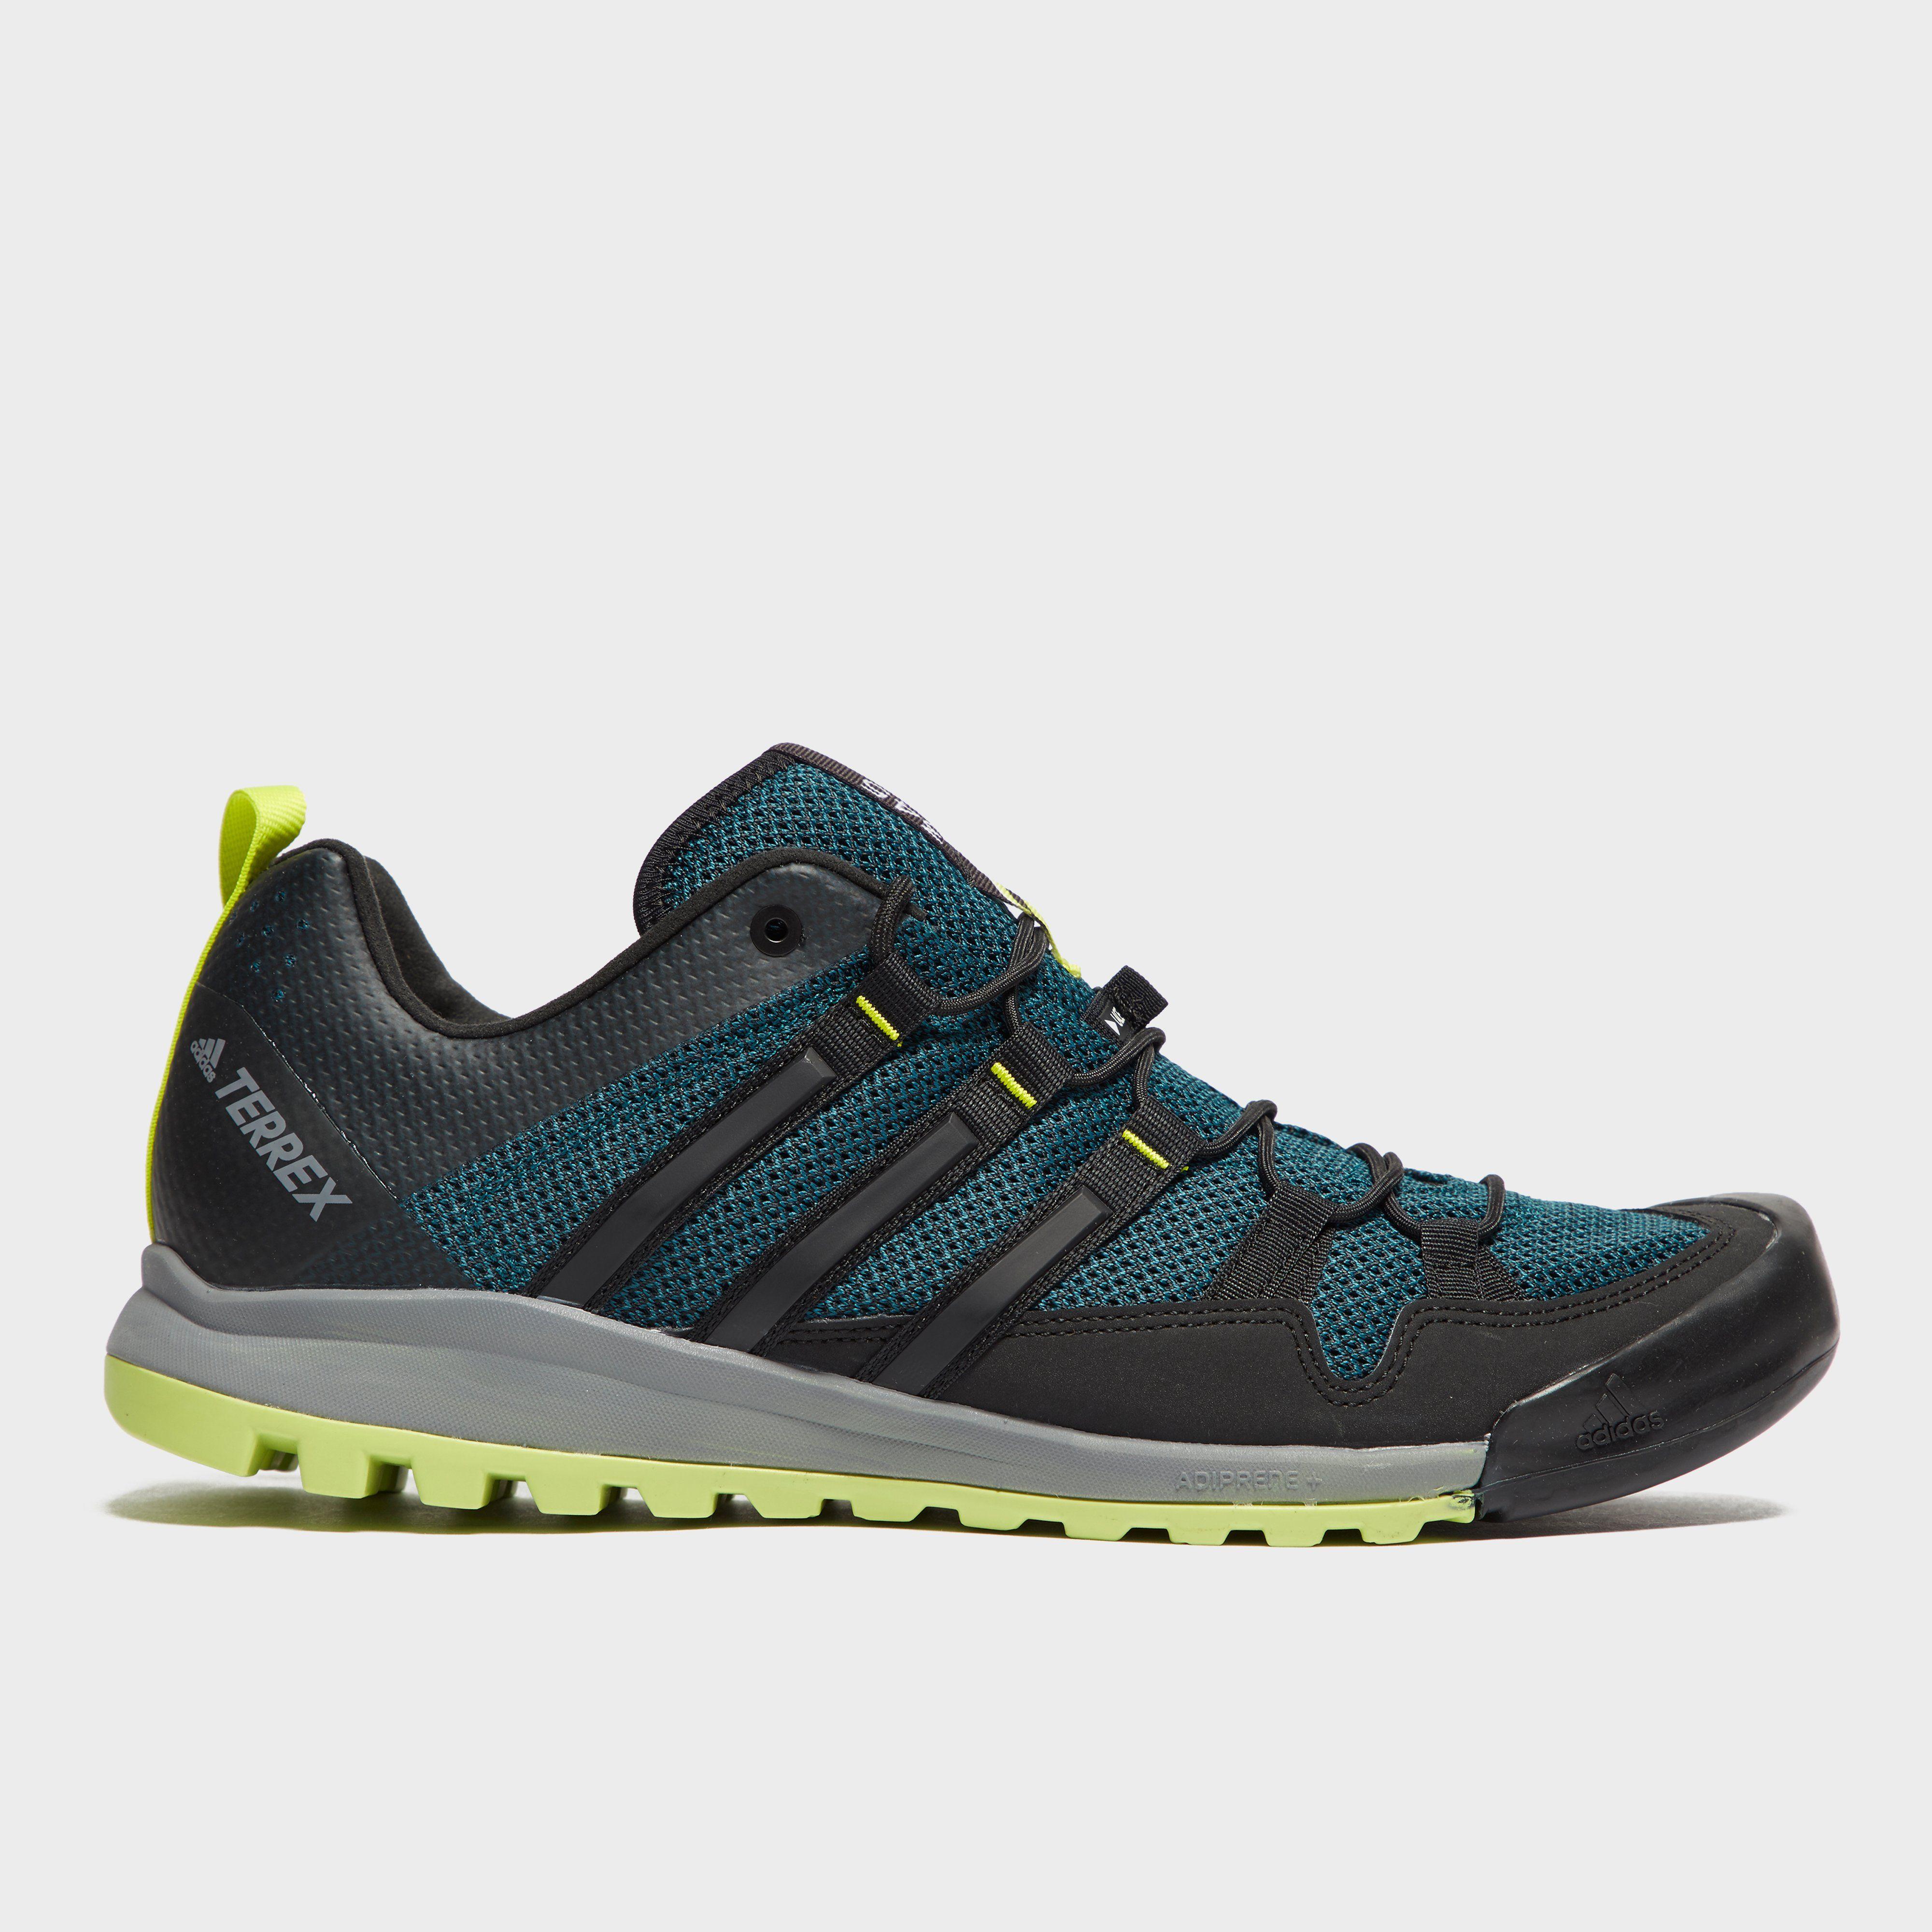 ADIDAS Men's Terrex Solo Shoes